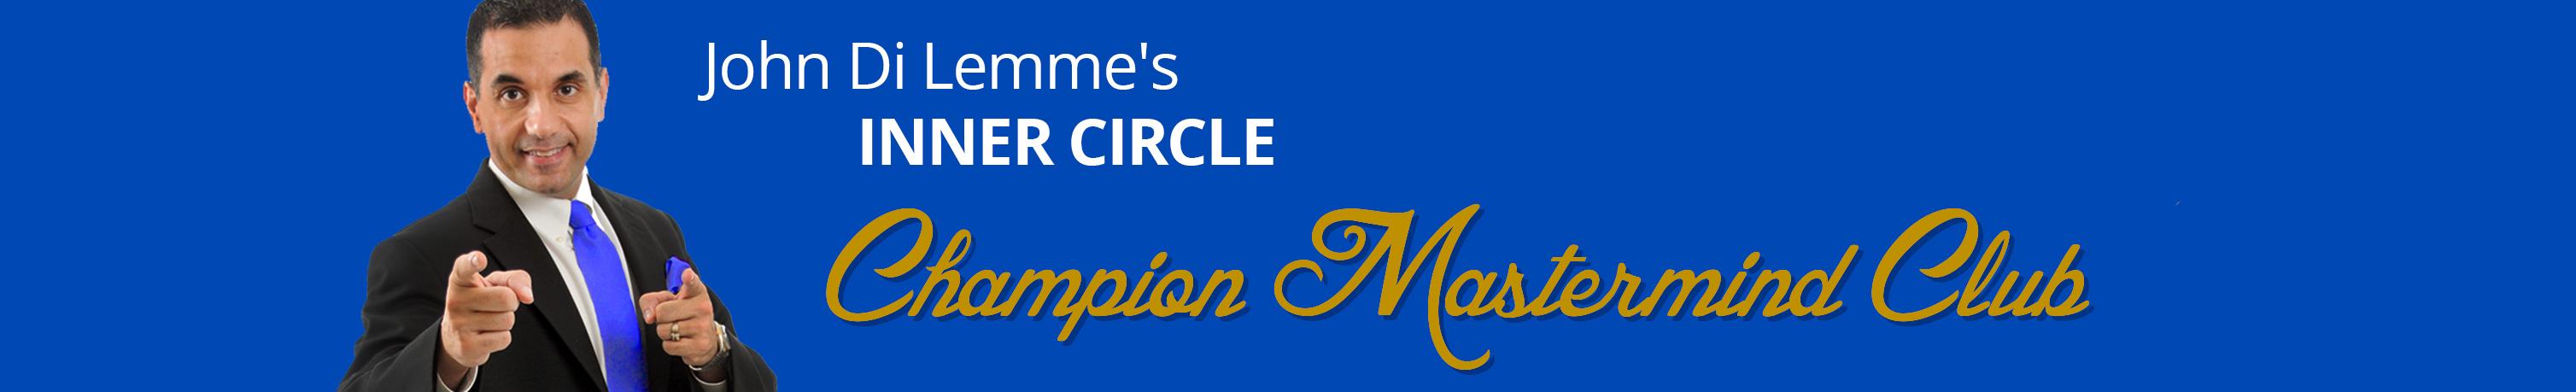 John Di Lemme's Inner Circle Mastermind Club Banner